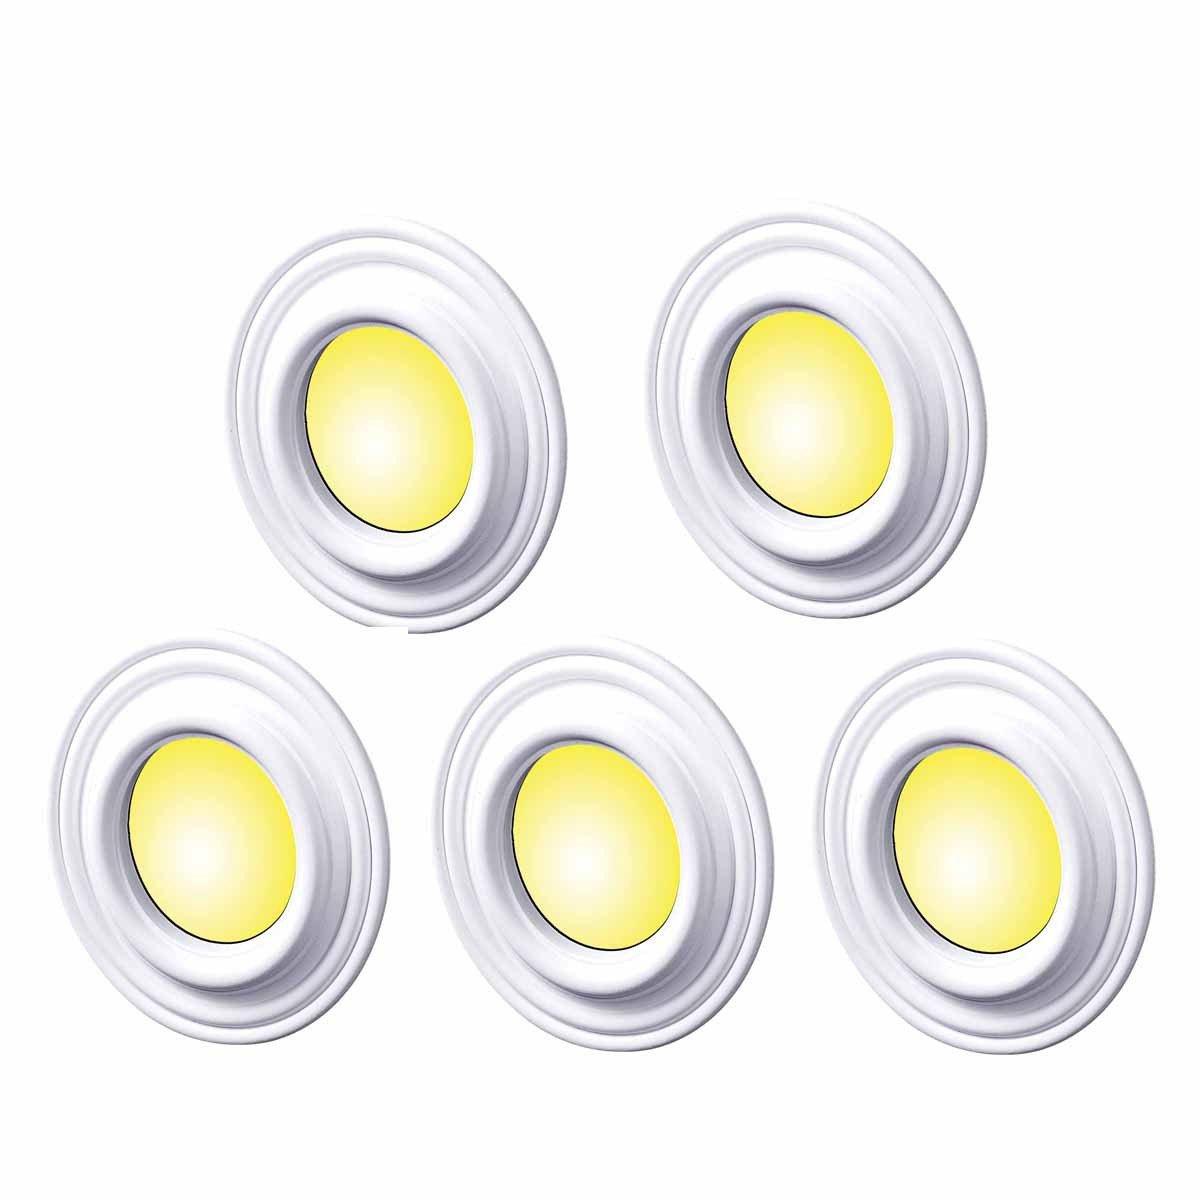 5 Spot Light Trim Medallions White Urethane 4'' ID Set Of 5